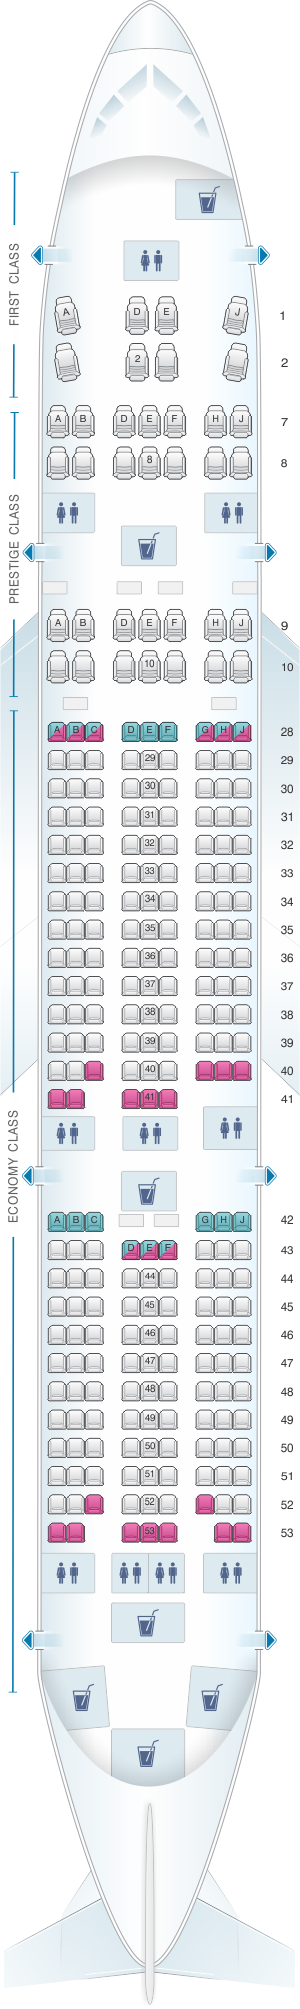 Seat map for Korean Air Boeing B777 200ER 261PAX